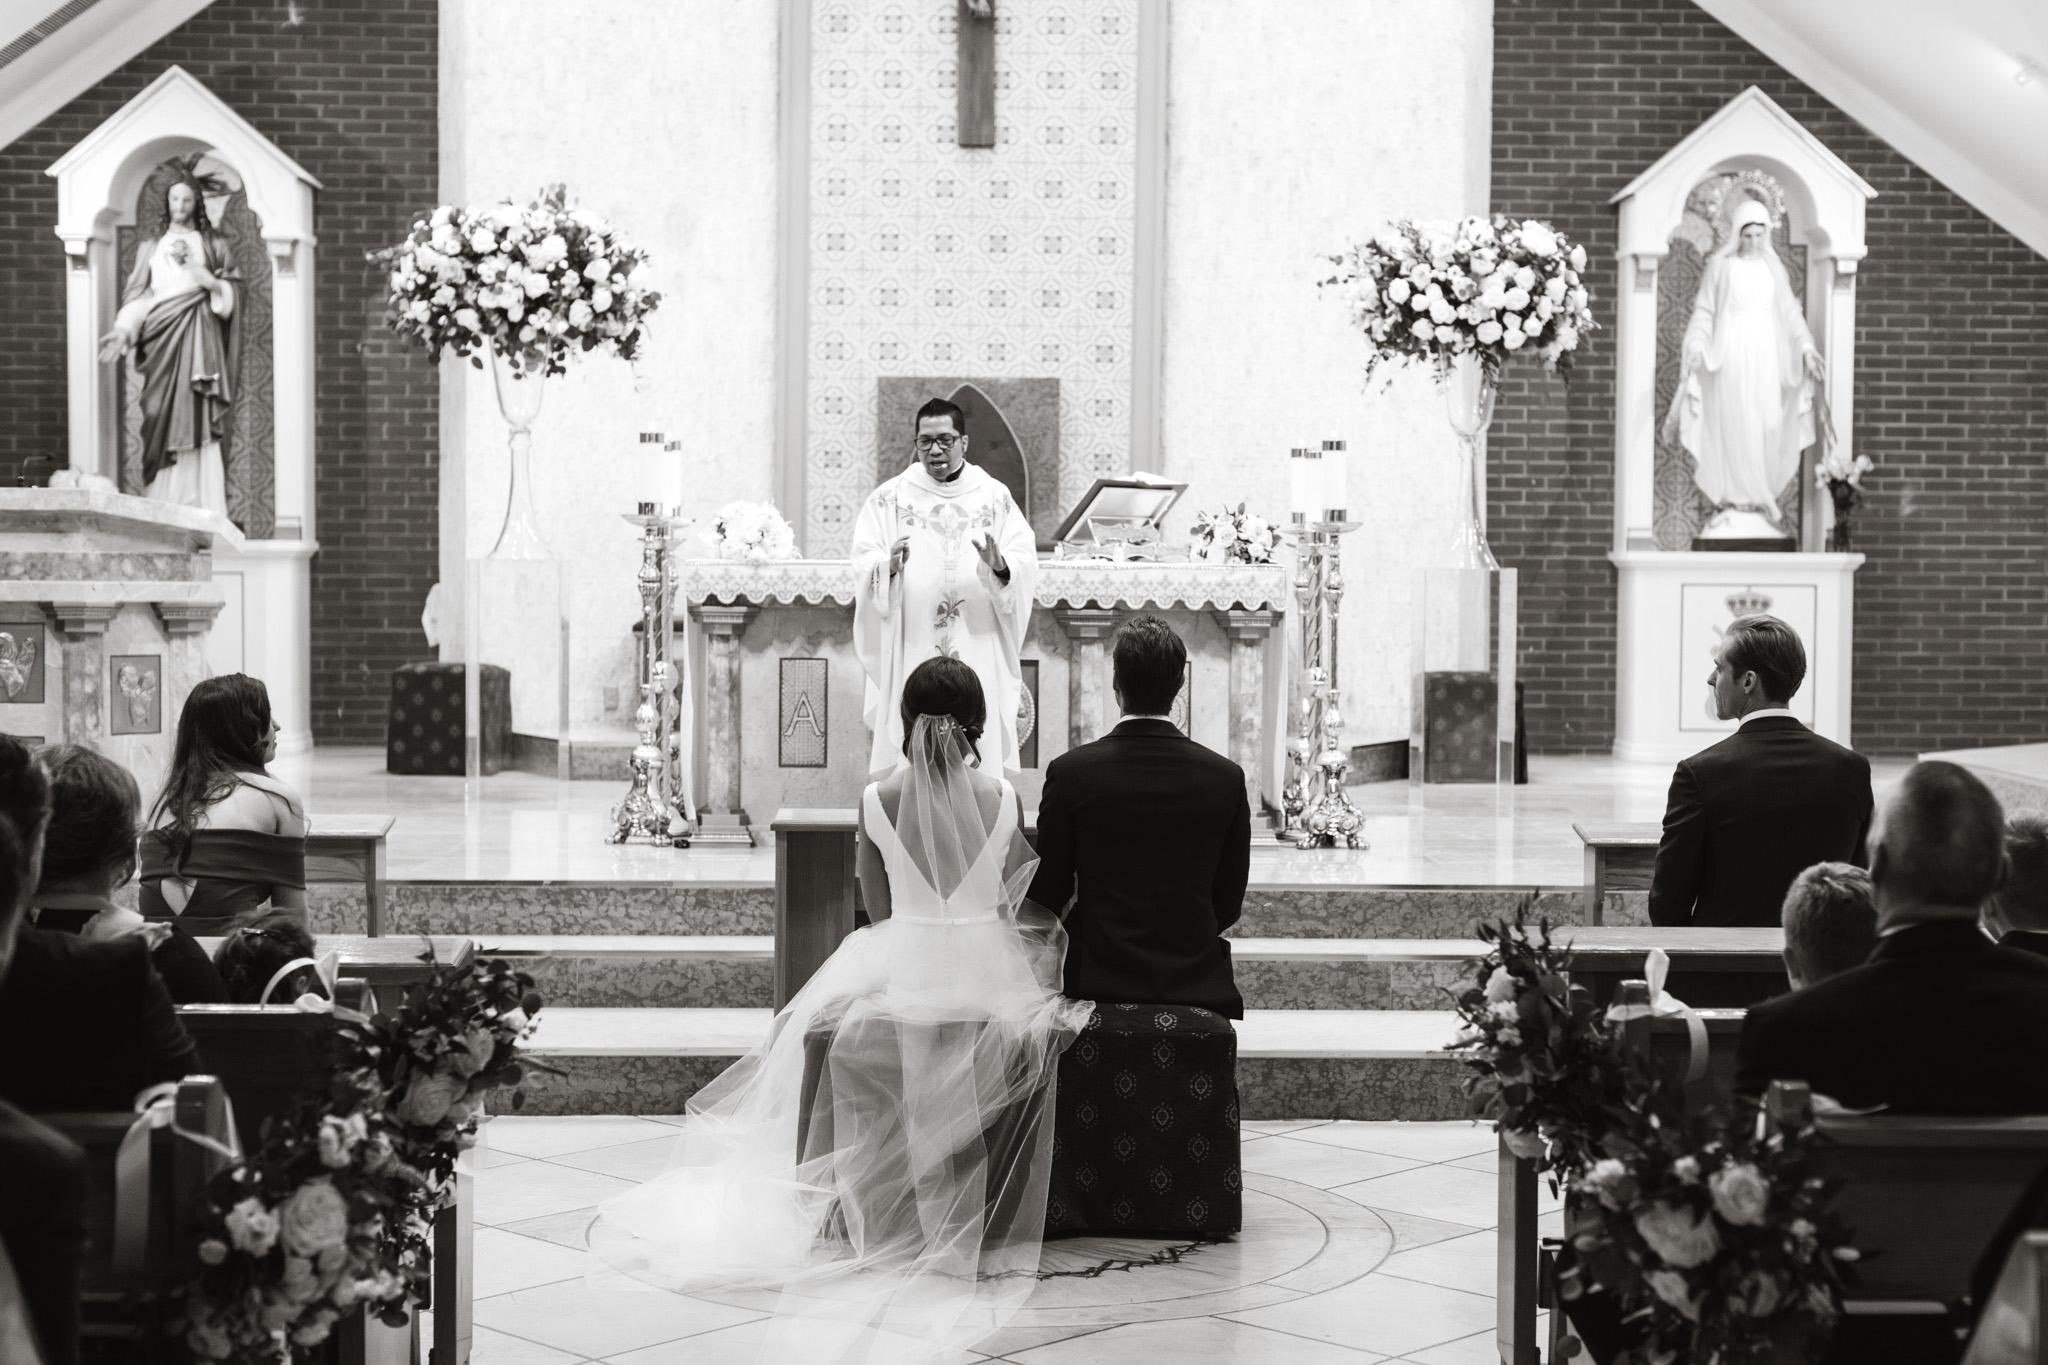 St. Margaret Mary Roman Catholic Church